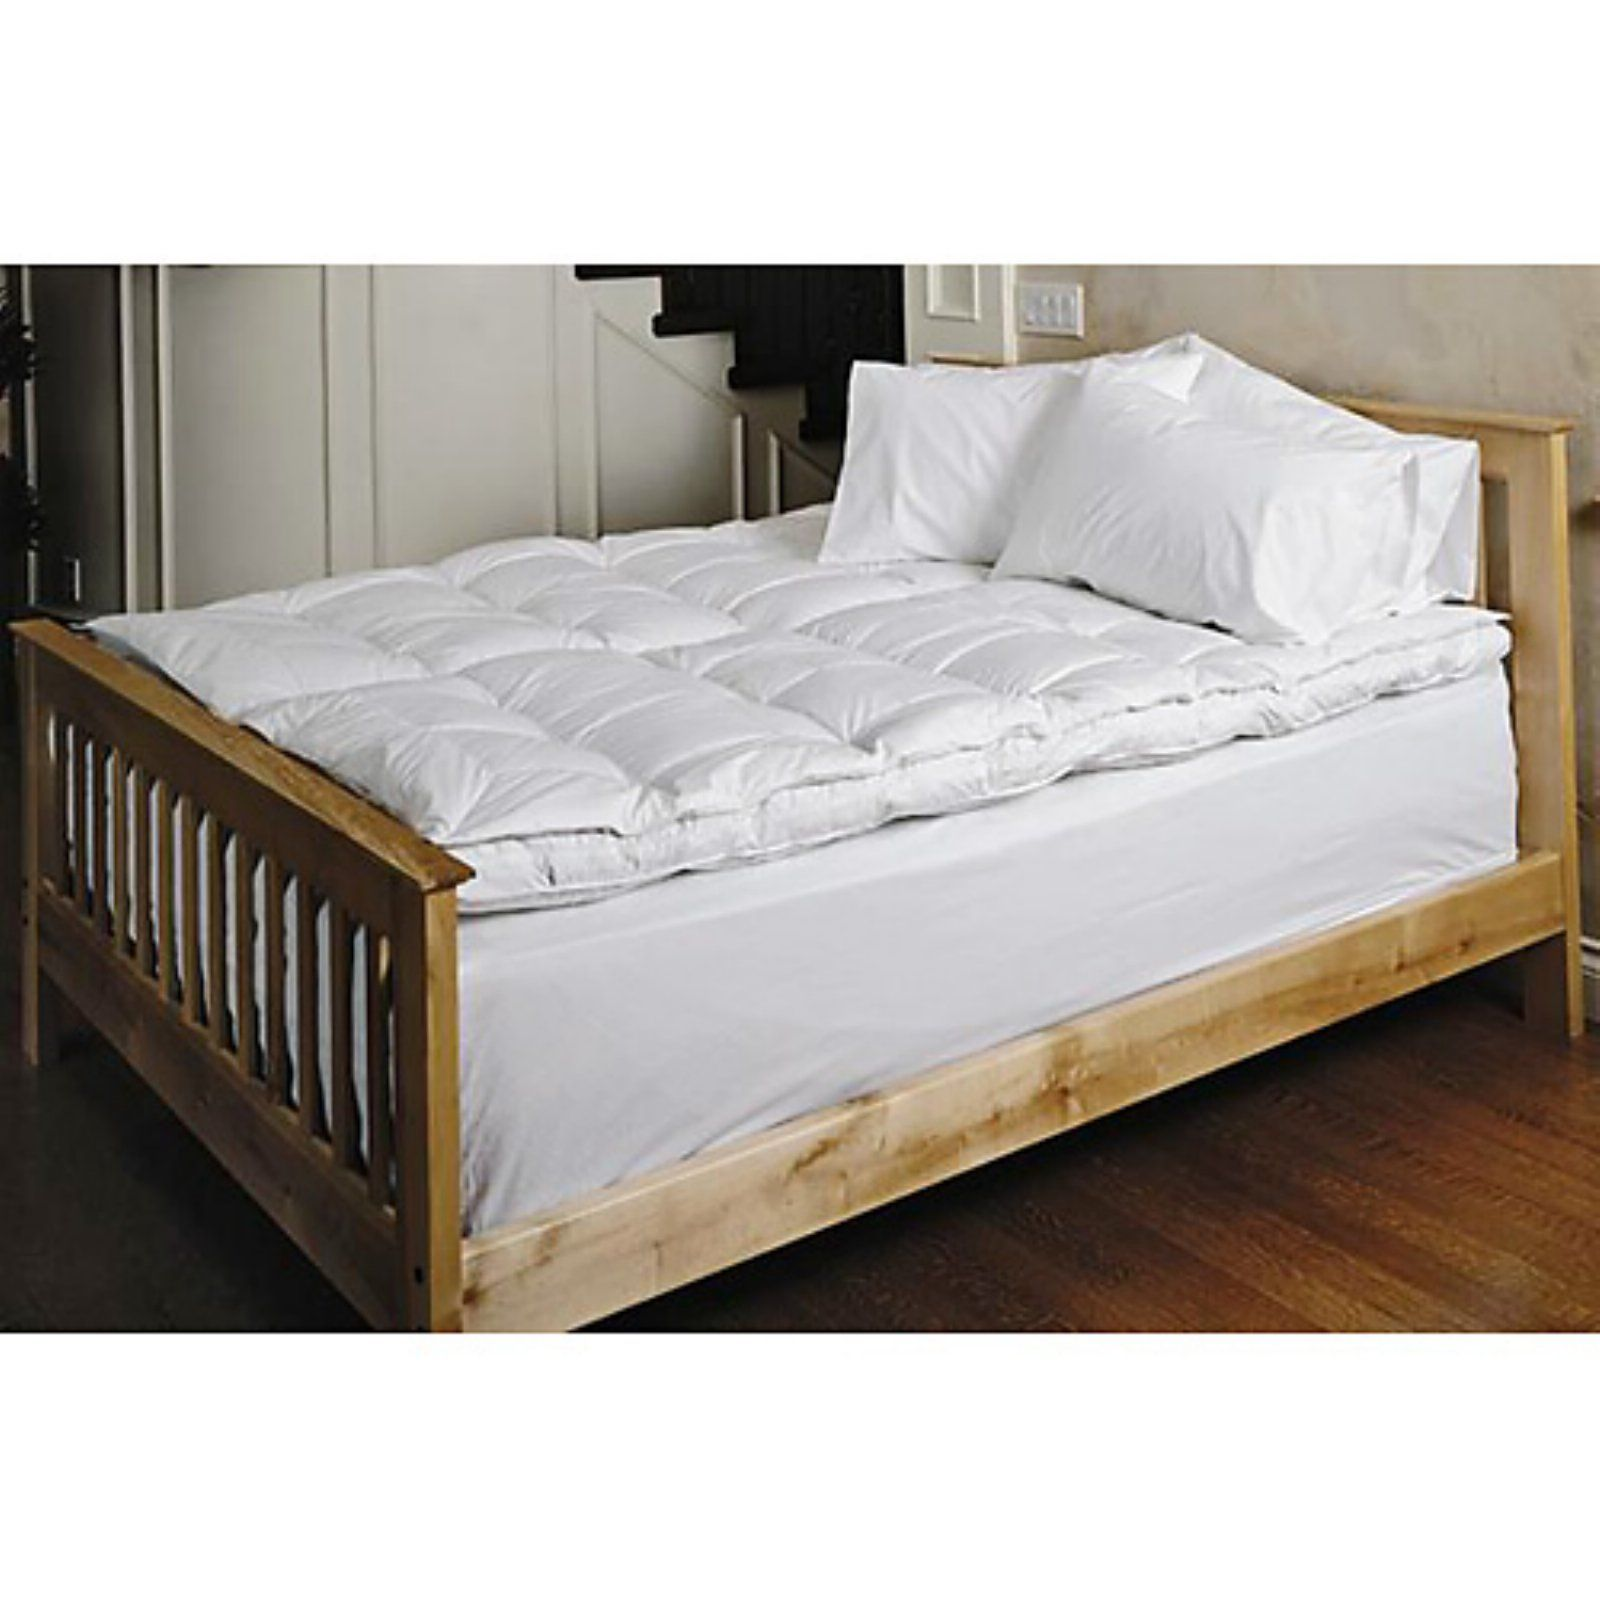 Daniadown White Goose Pillow Top Feather Bed Feather Mattress Mattress Mattress Topper